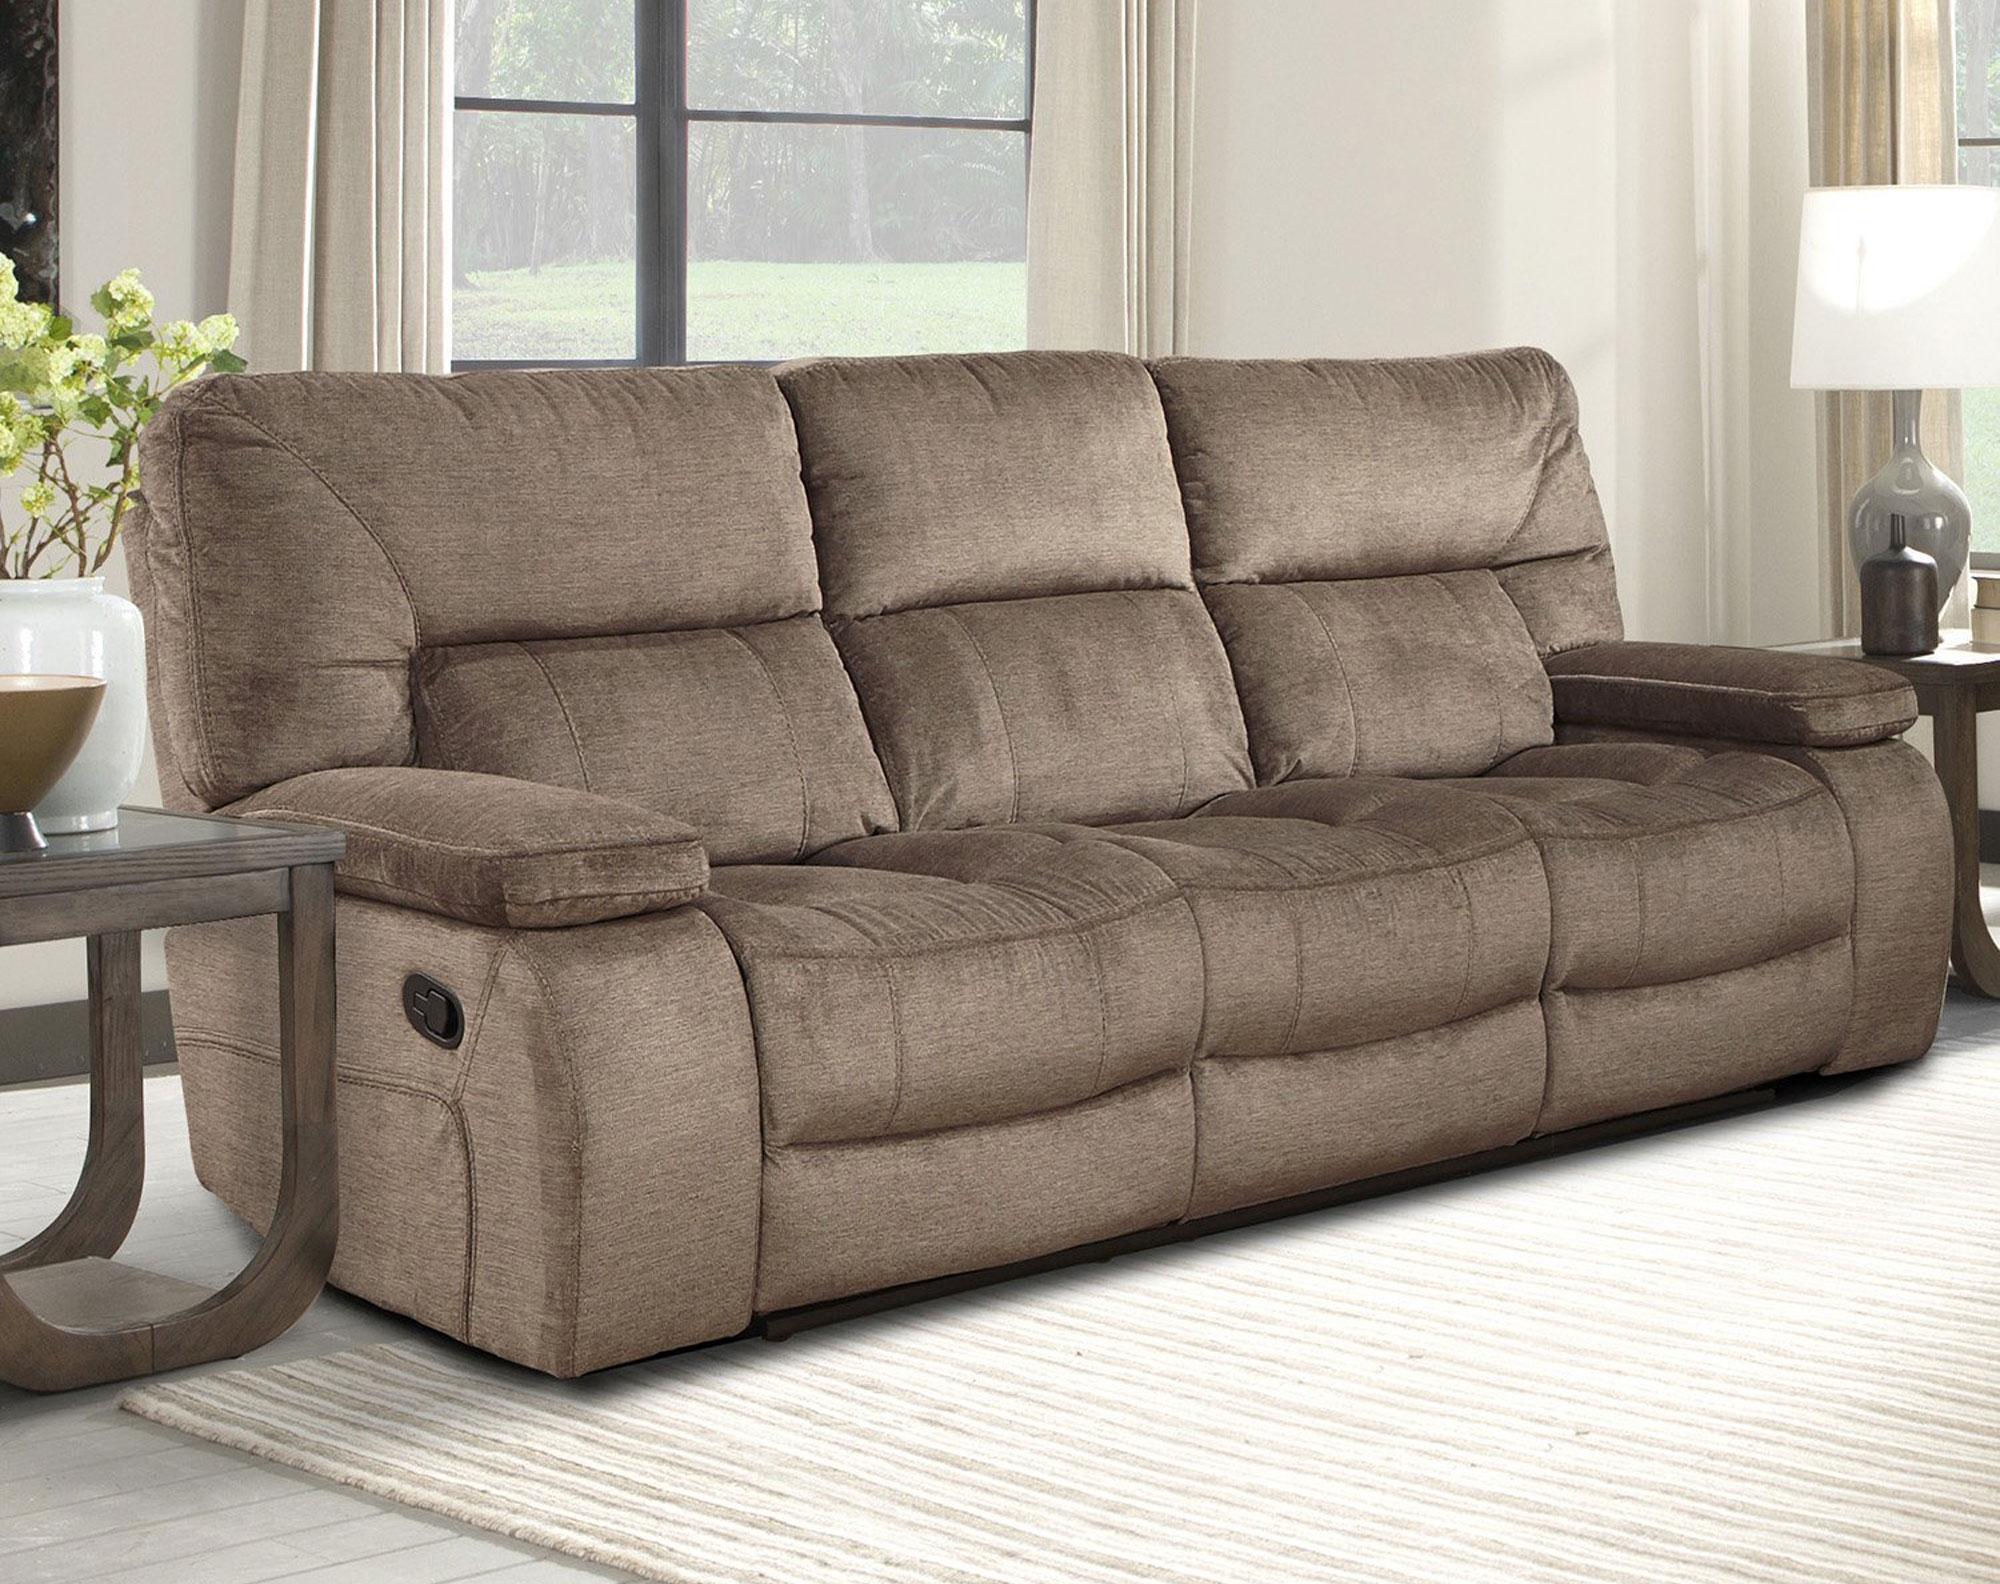 Chapman Kona Triple Reclining Sofa